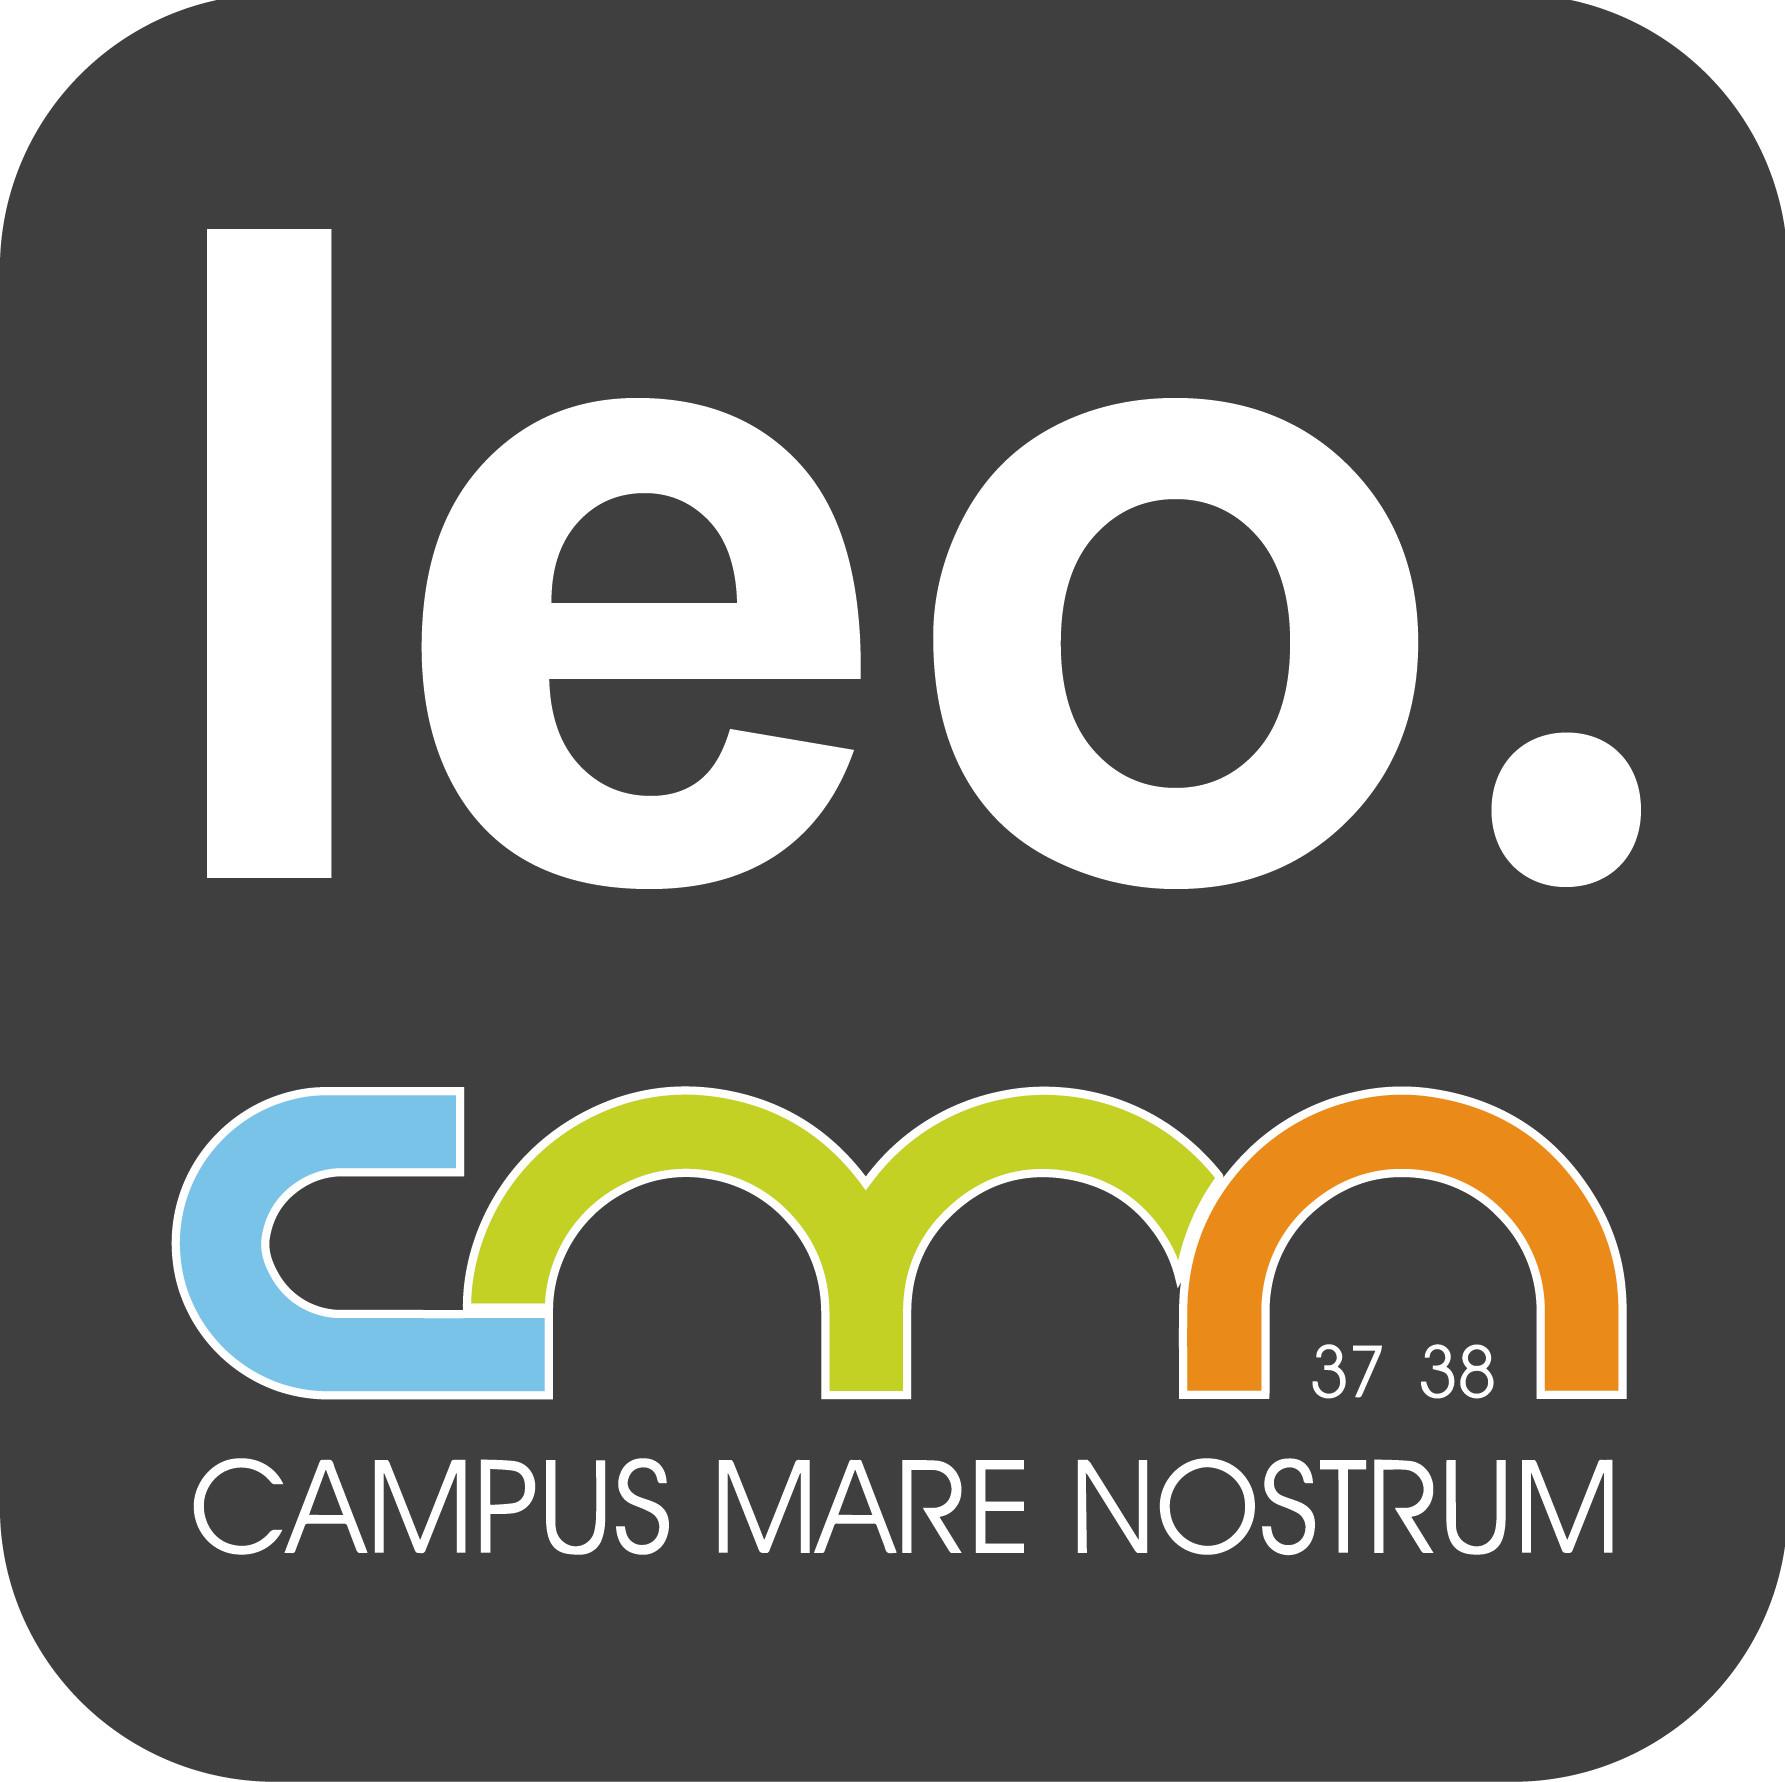 Logo LeoCMN